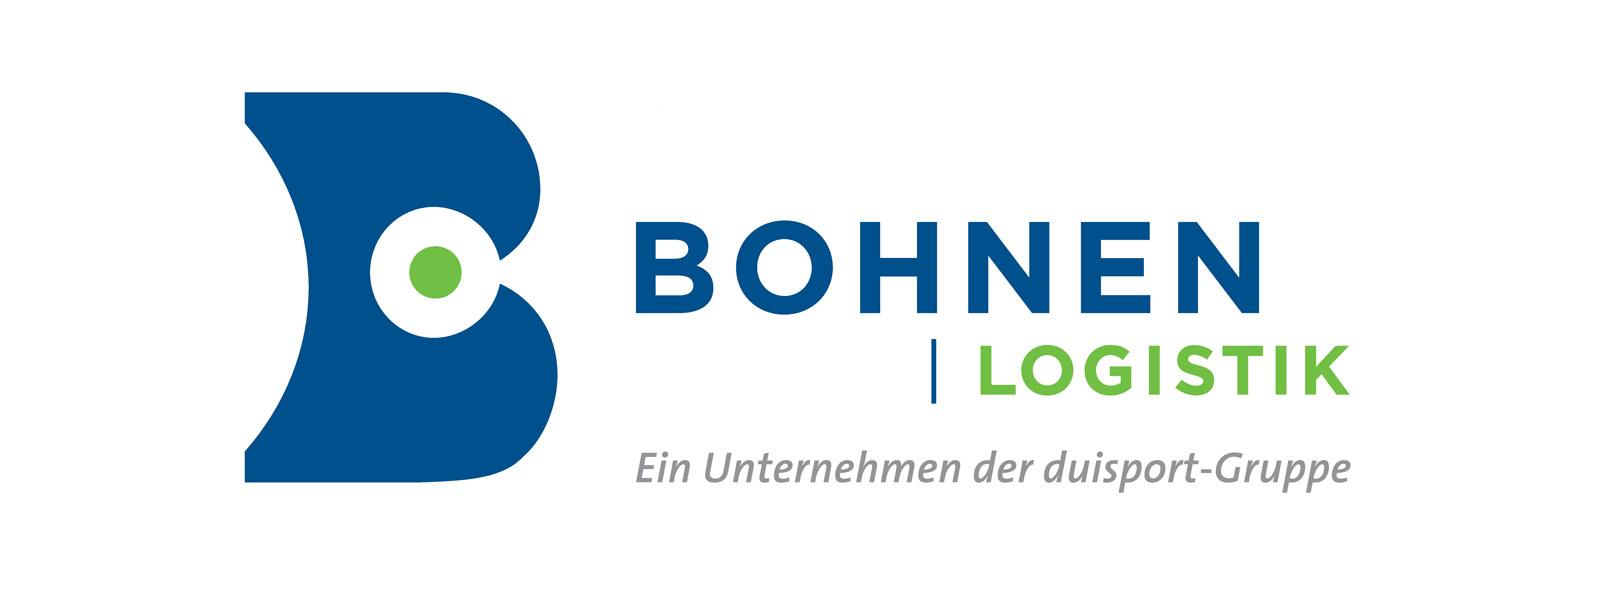 Bohnen Logistik Logo - duisport Gruppe